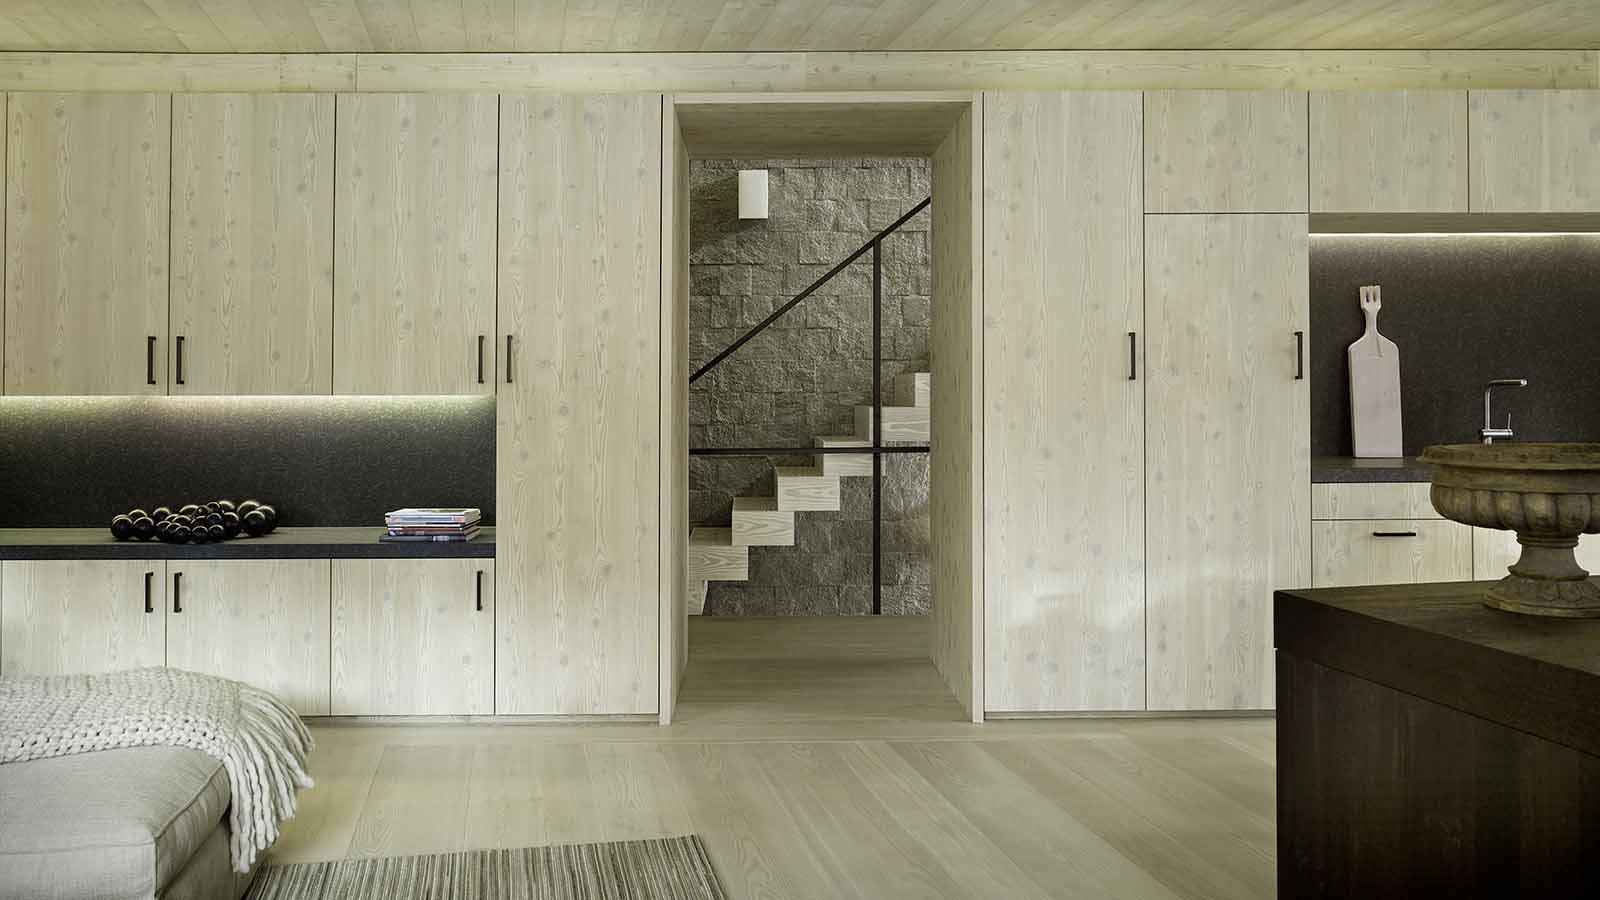 ruegg tueren rahmen 24005 r egg ag kaltbrunn schreinerei holzbau zimmerei. Black Bedroom Furniture Sets. Home Design Ideas